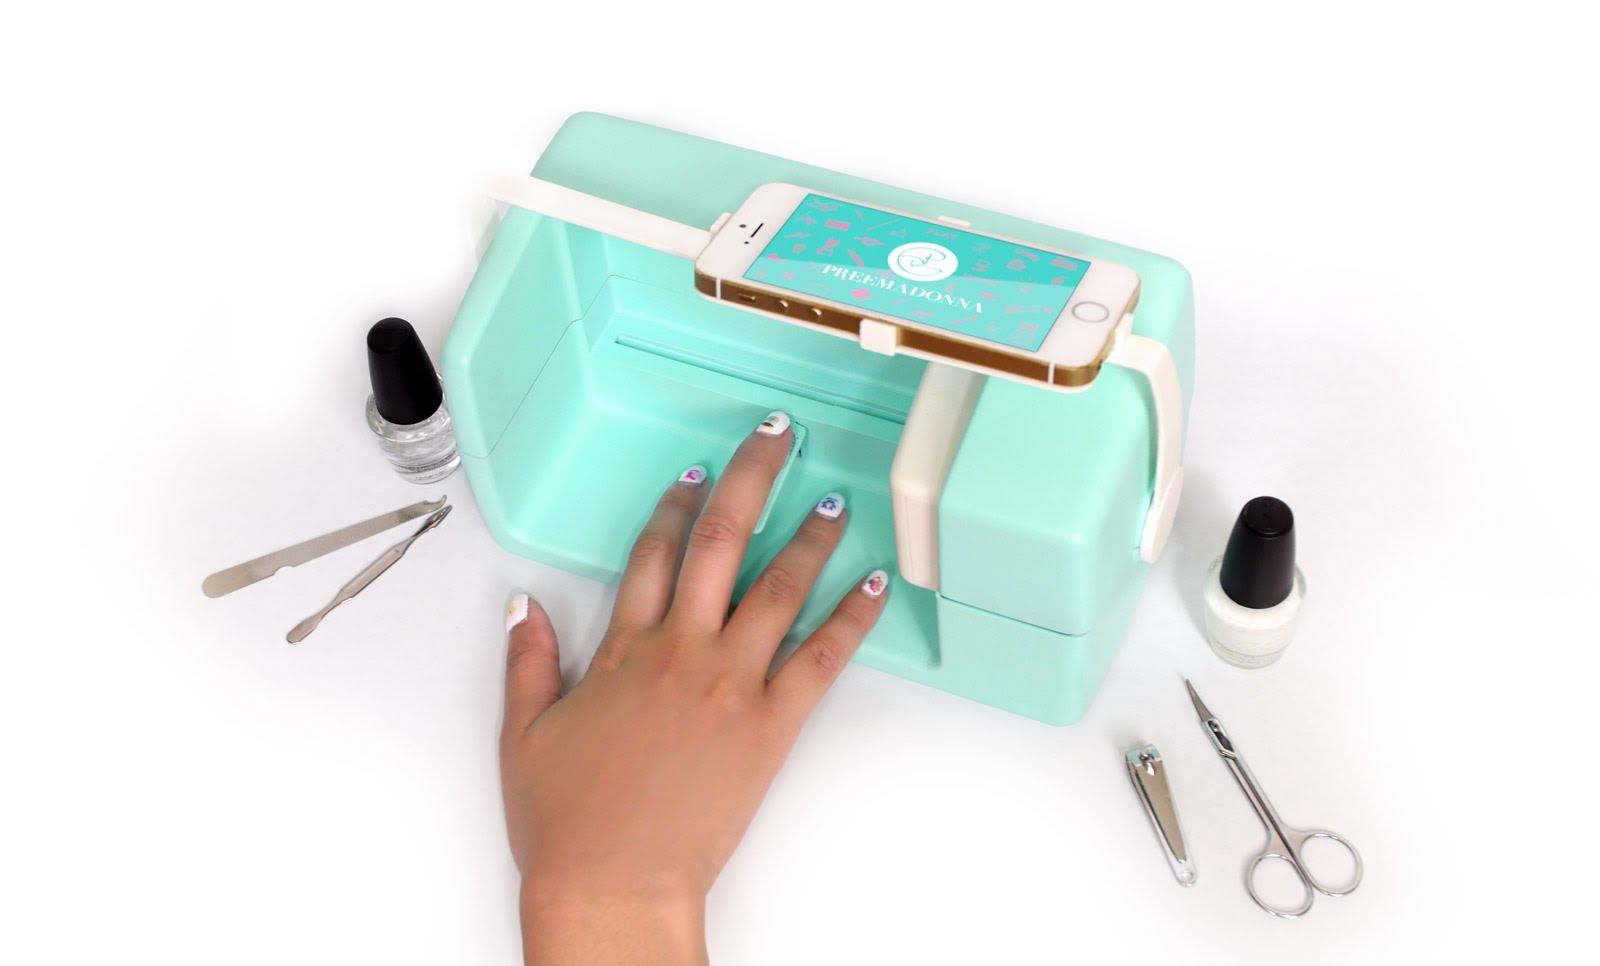 nailbot l 39 imprimante nail art connect e ton smartphone. Black Bedroom Furniture Sets. Home Design Ideas